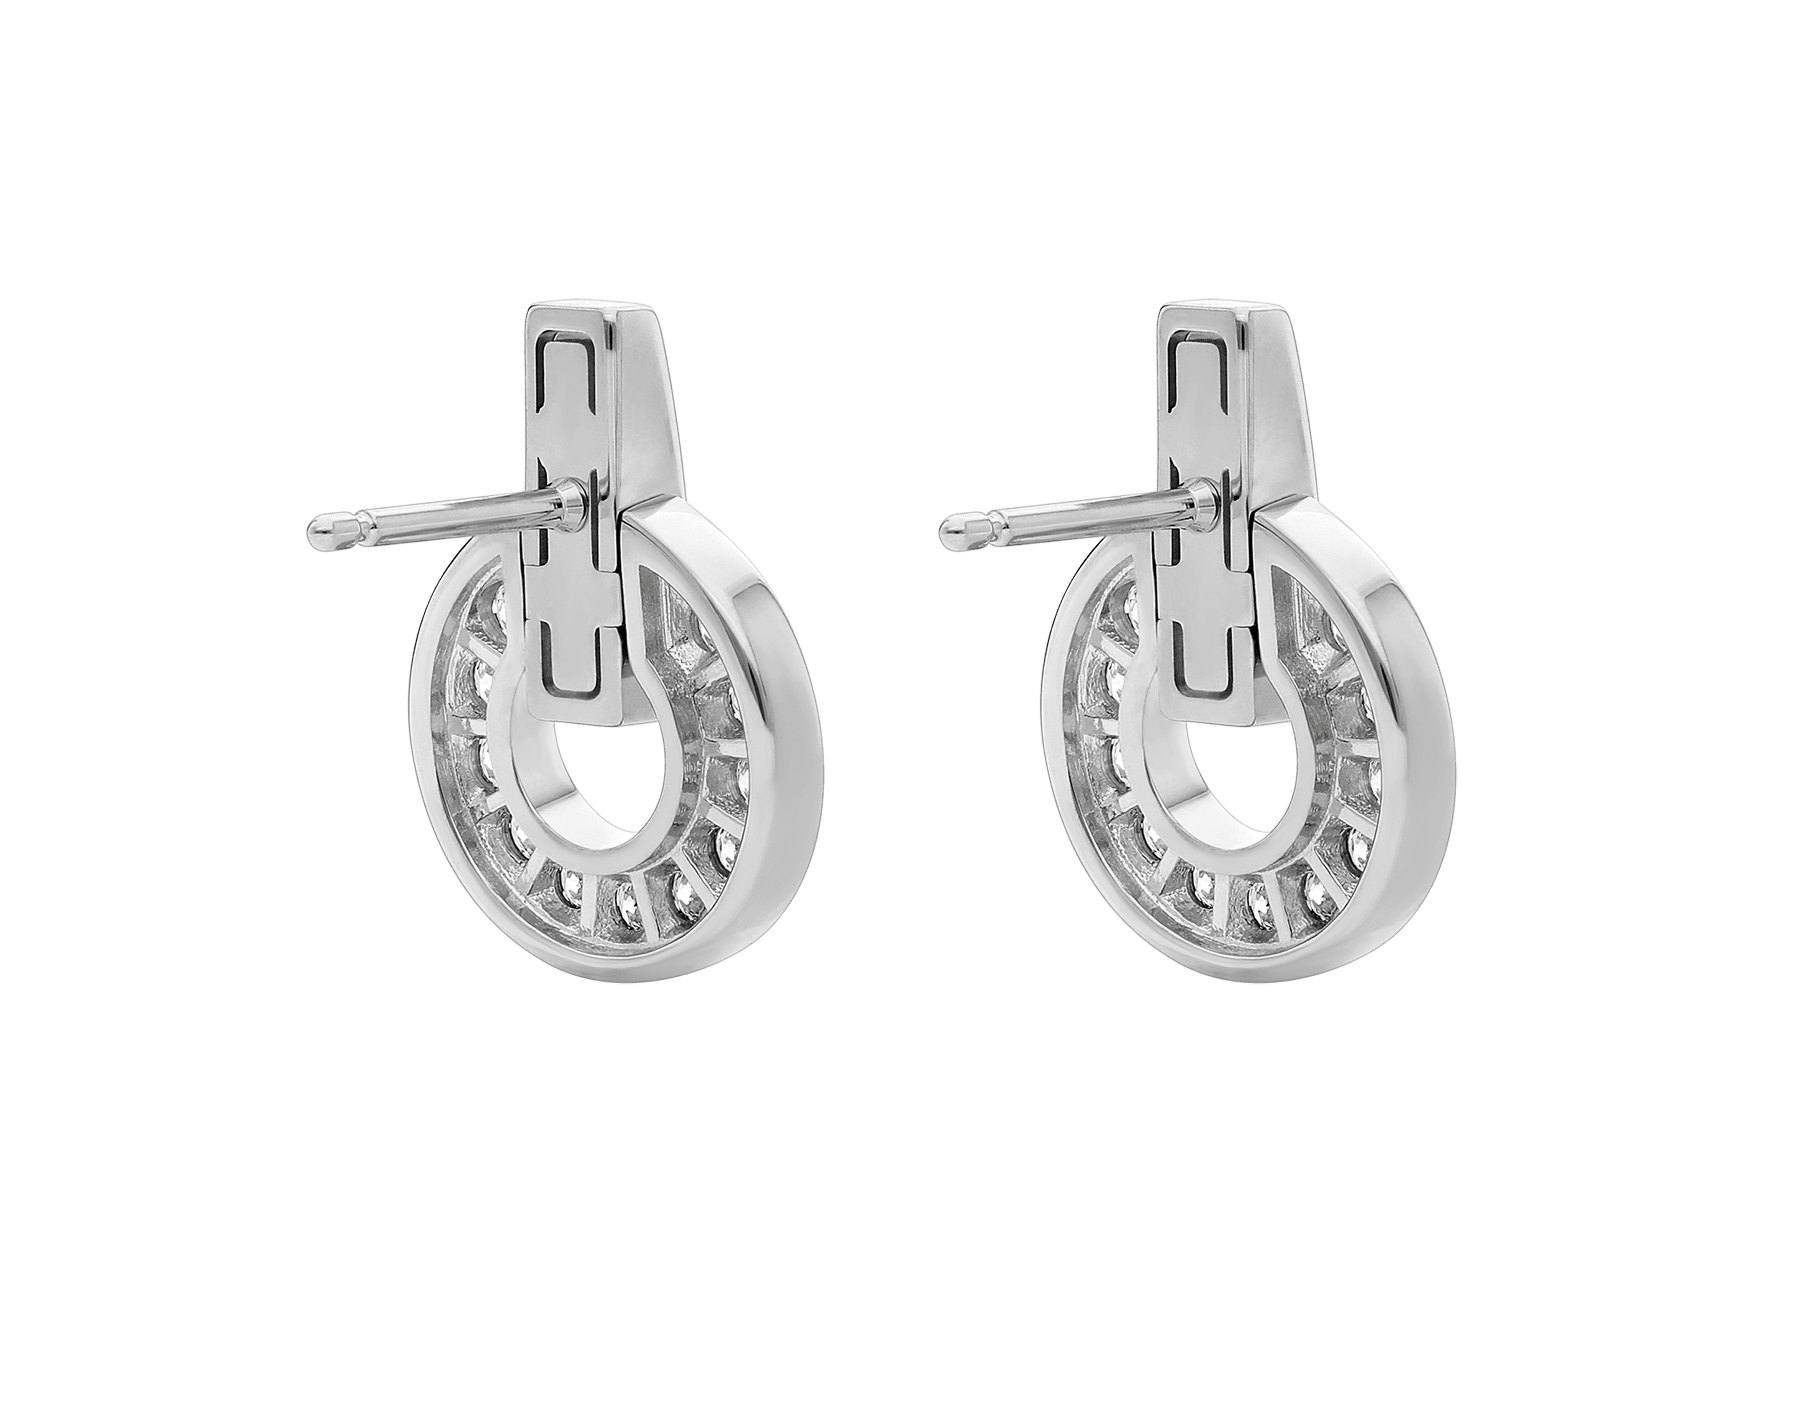 BVLGARI BVLGARI系列白色18K金镂空耳环,饰以全密镶钻石 357940 image 3